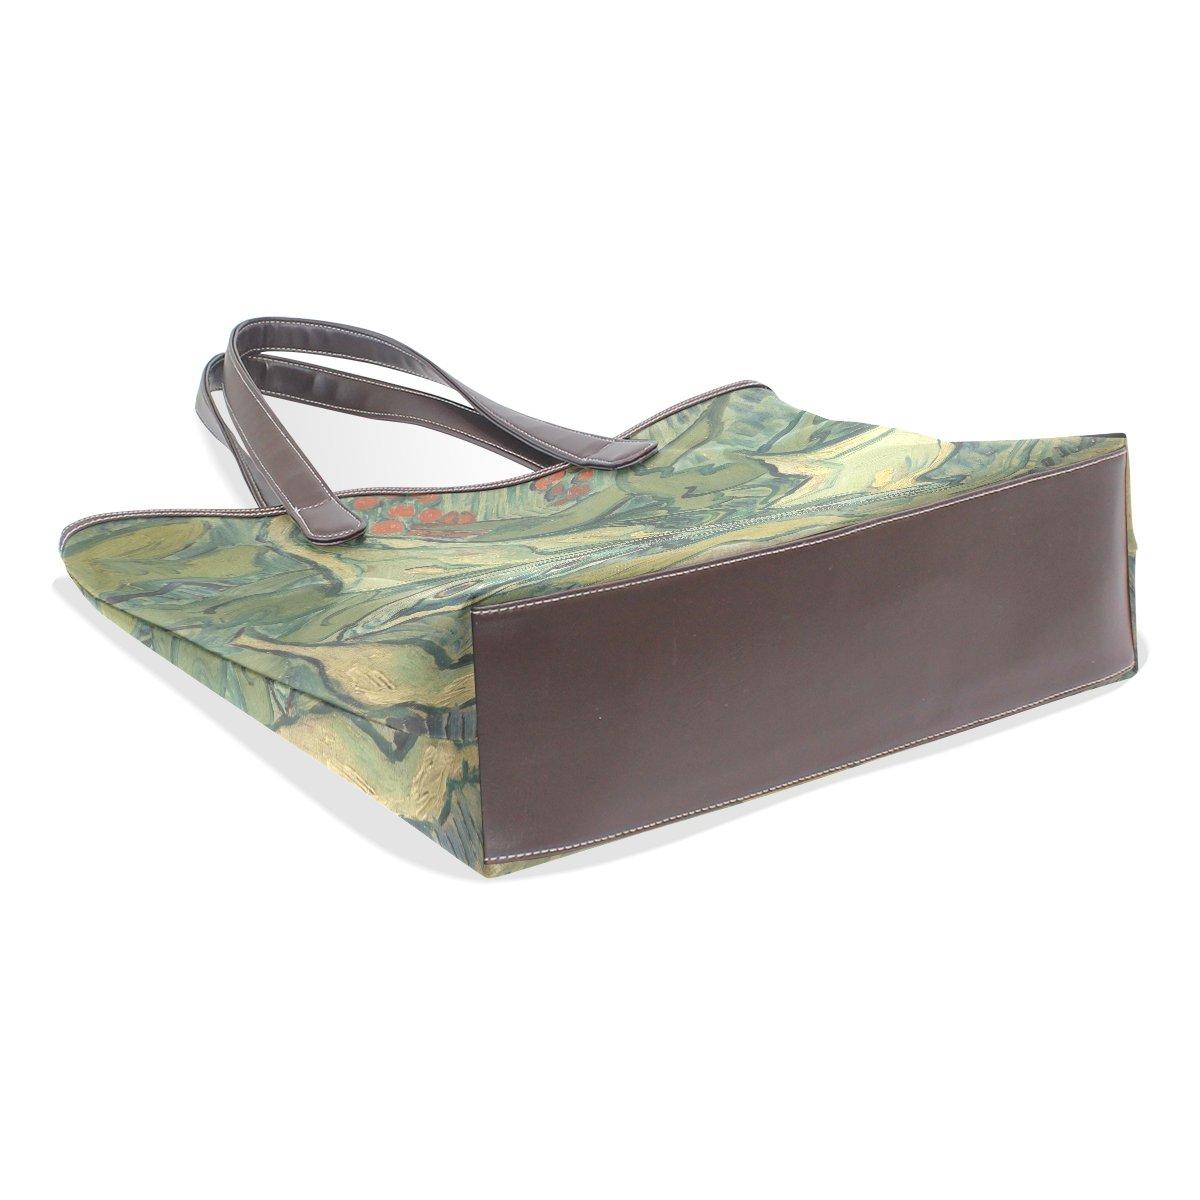 Ye Store Butterfly Lady PU Leather Handbag Tote Bag Shoulder Bag Shopping Bag